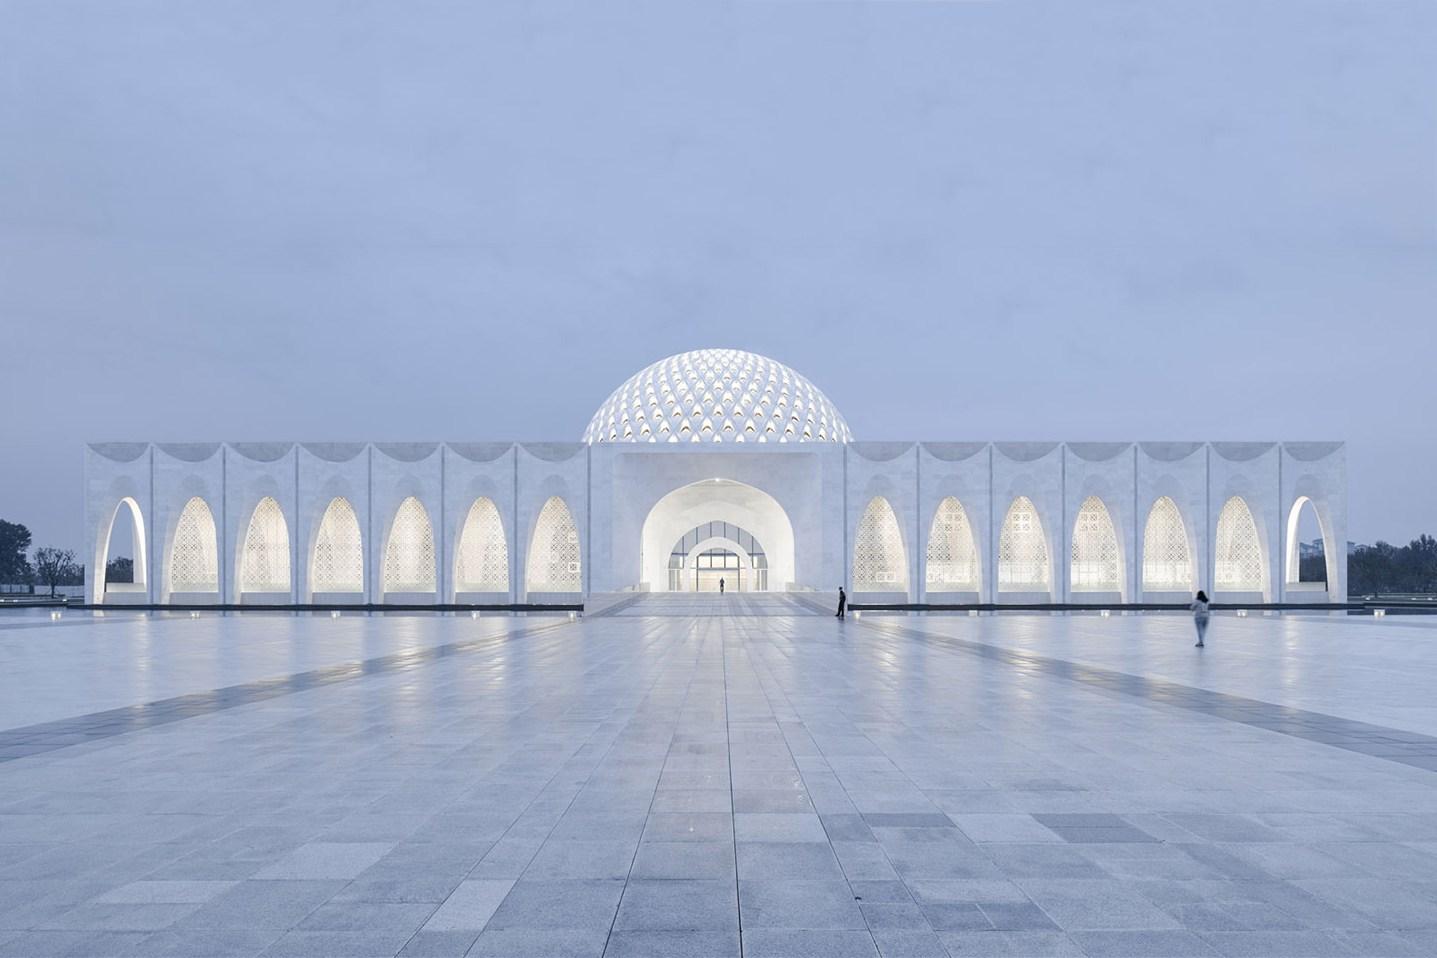 dachang-muslim-cultural-center-dachang-county-china